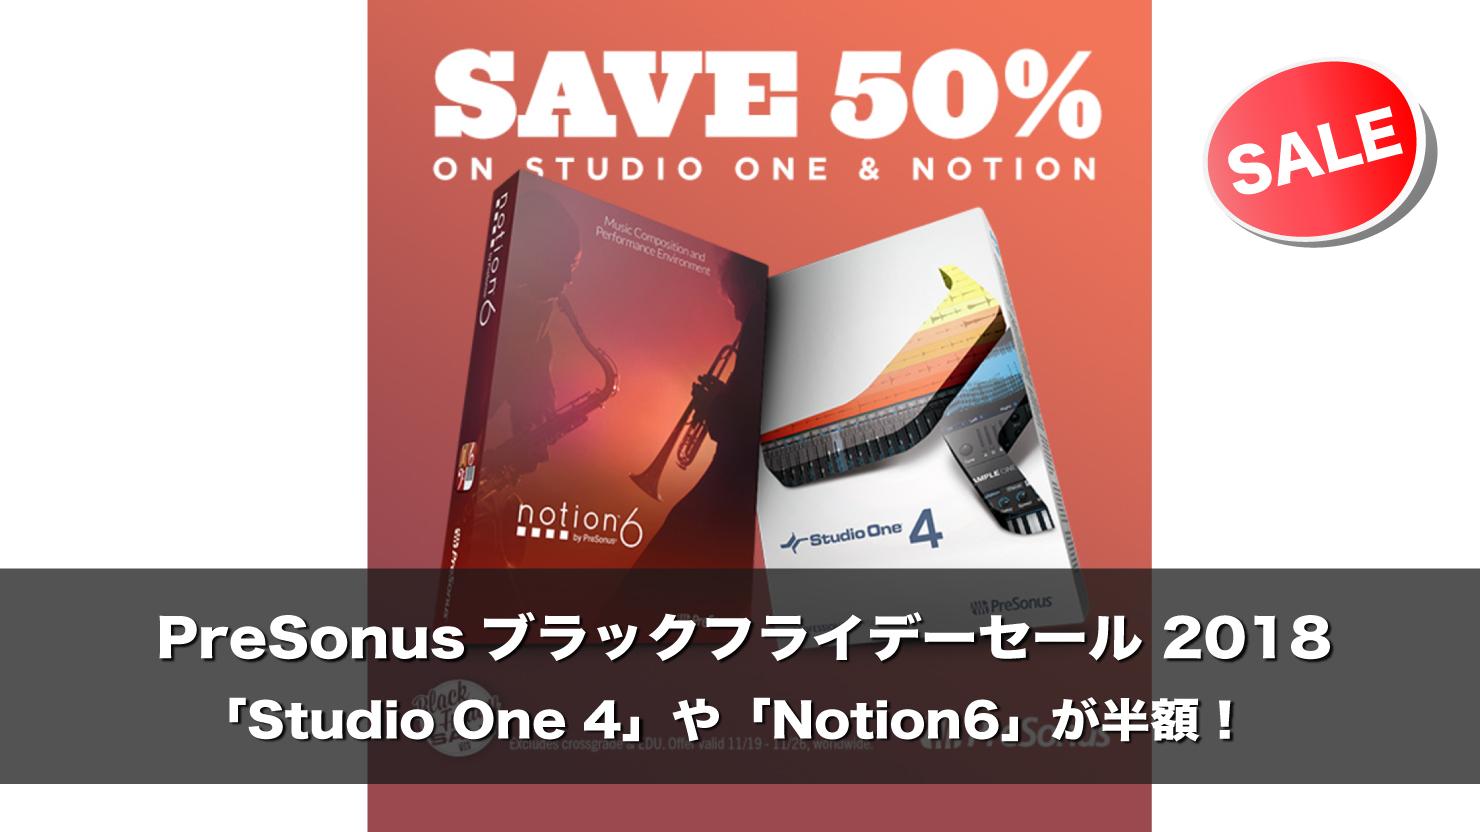 【50%OFF】人気のDAWソフトPreSonus「Studio One 4」が半額! ブラックフライデー2018